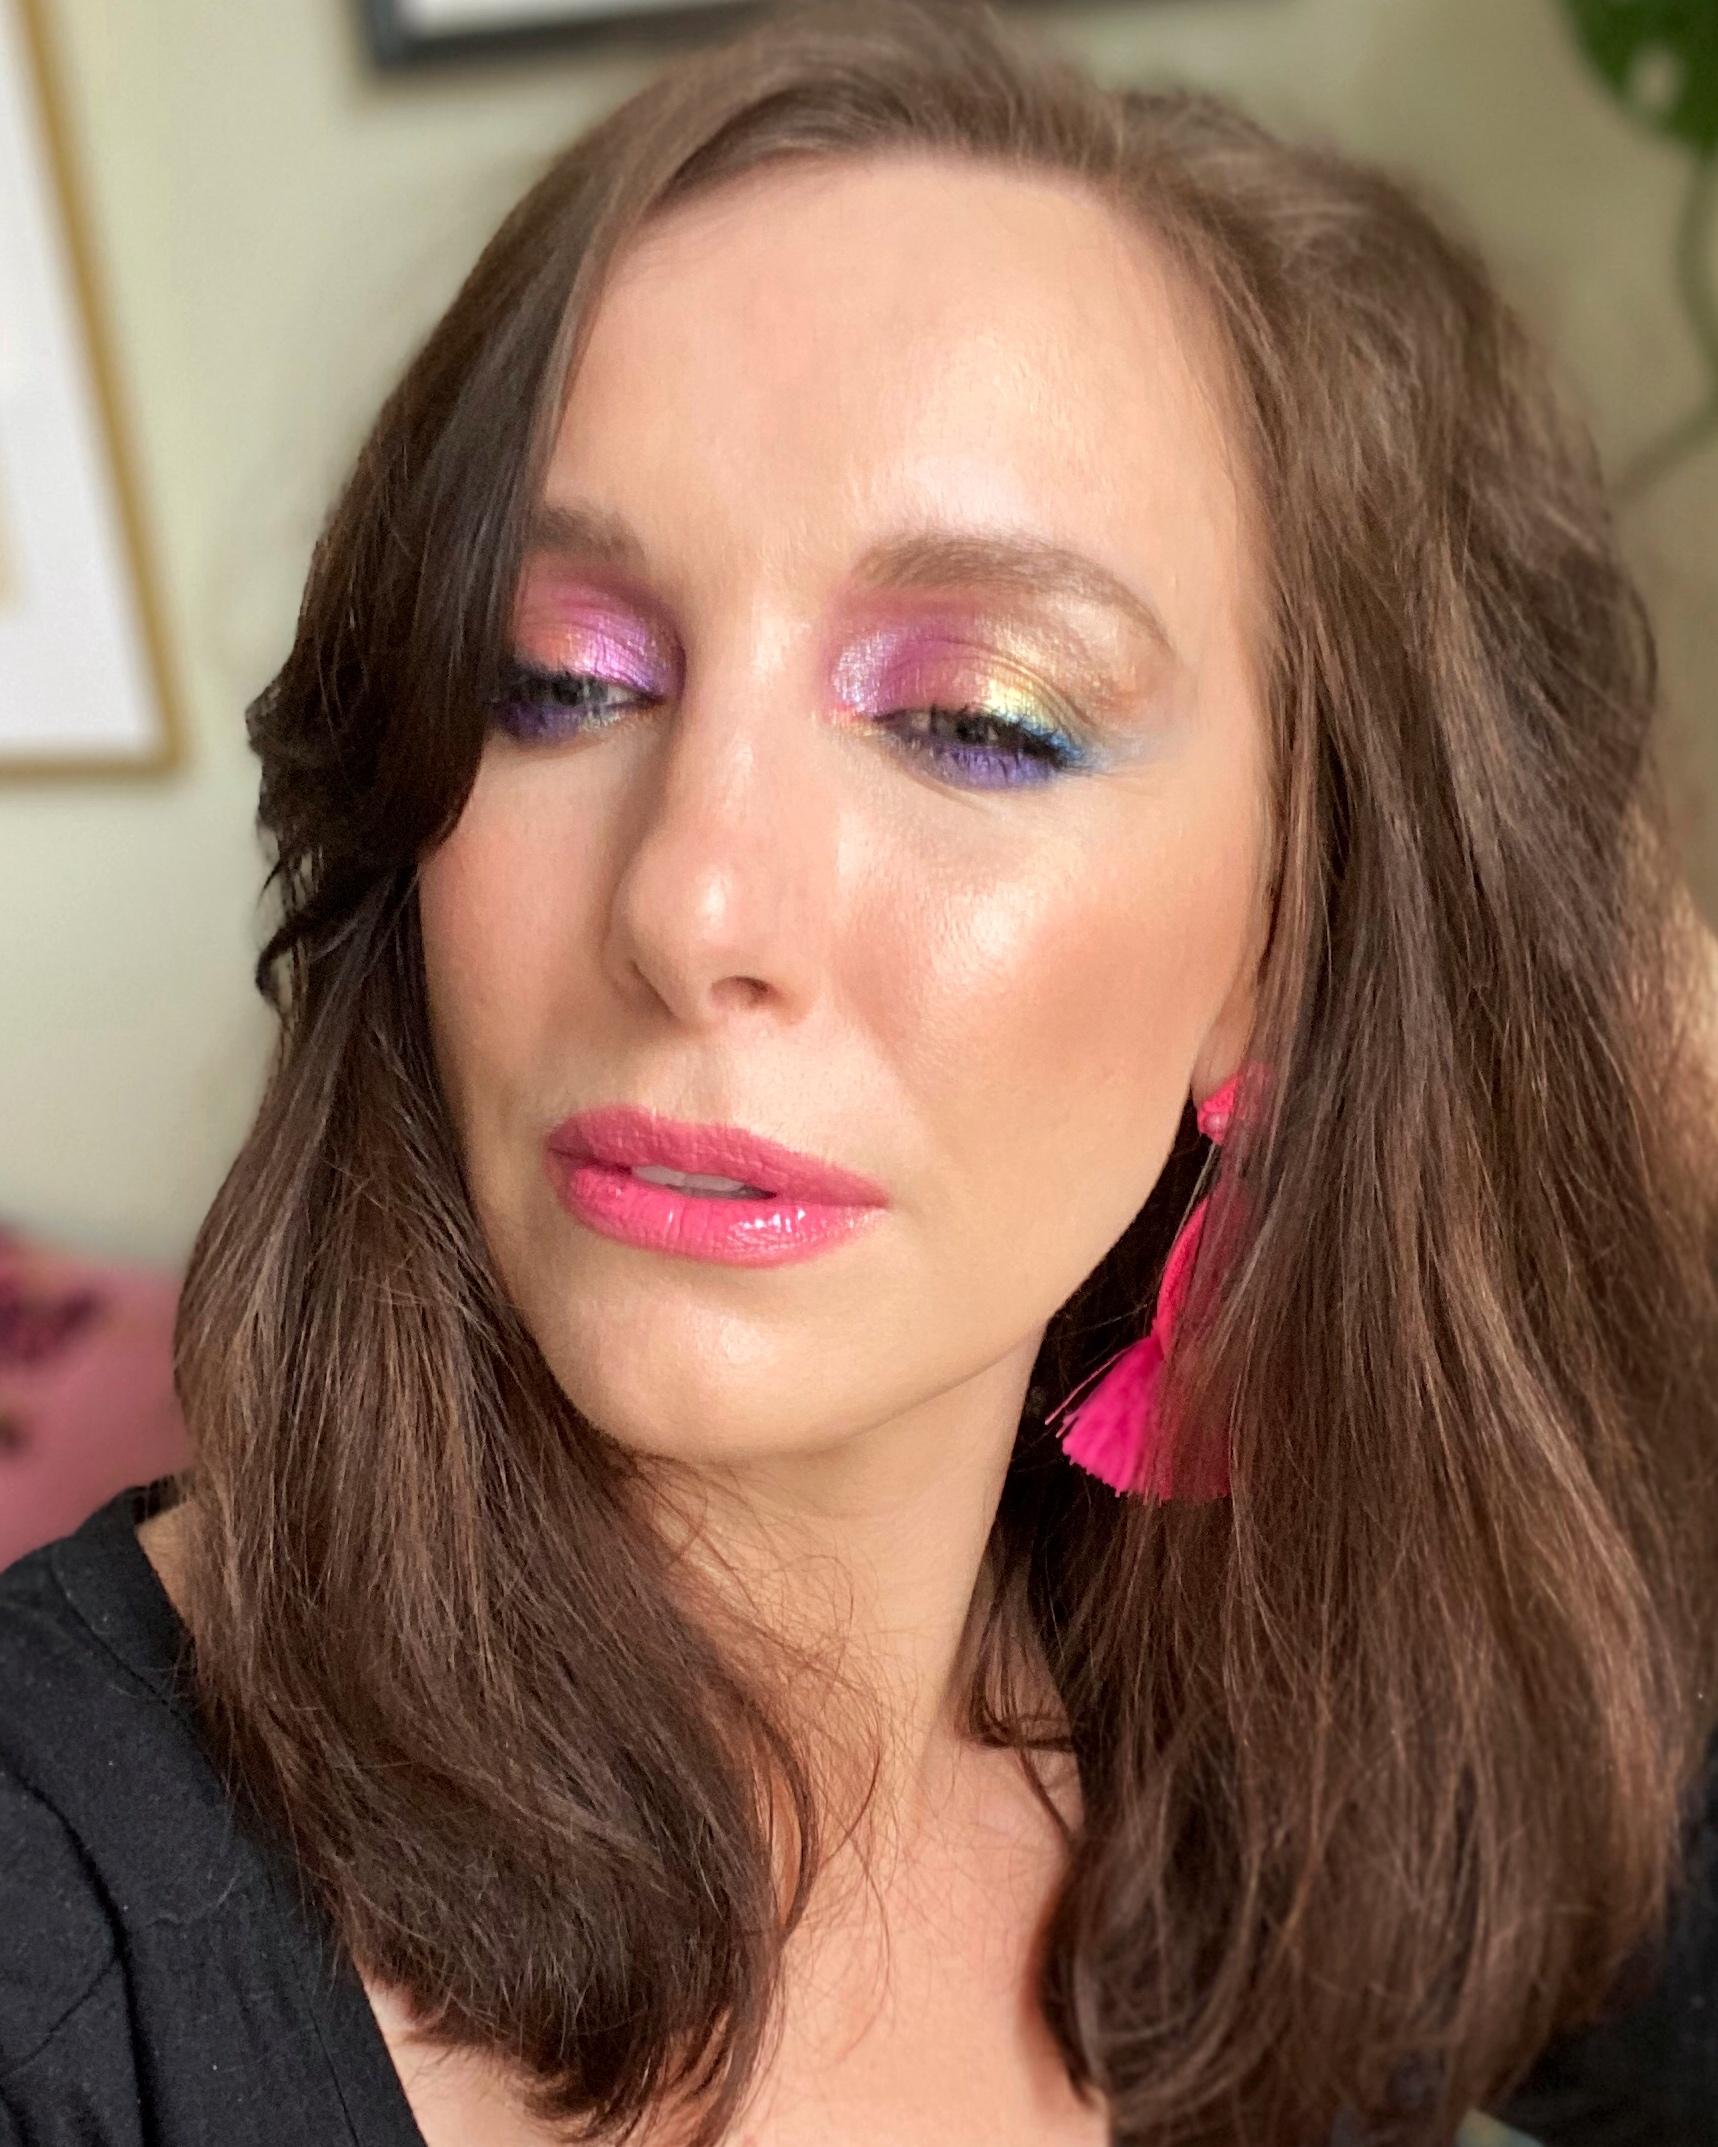 rainbow eye makeup for pride